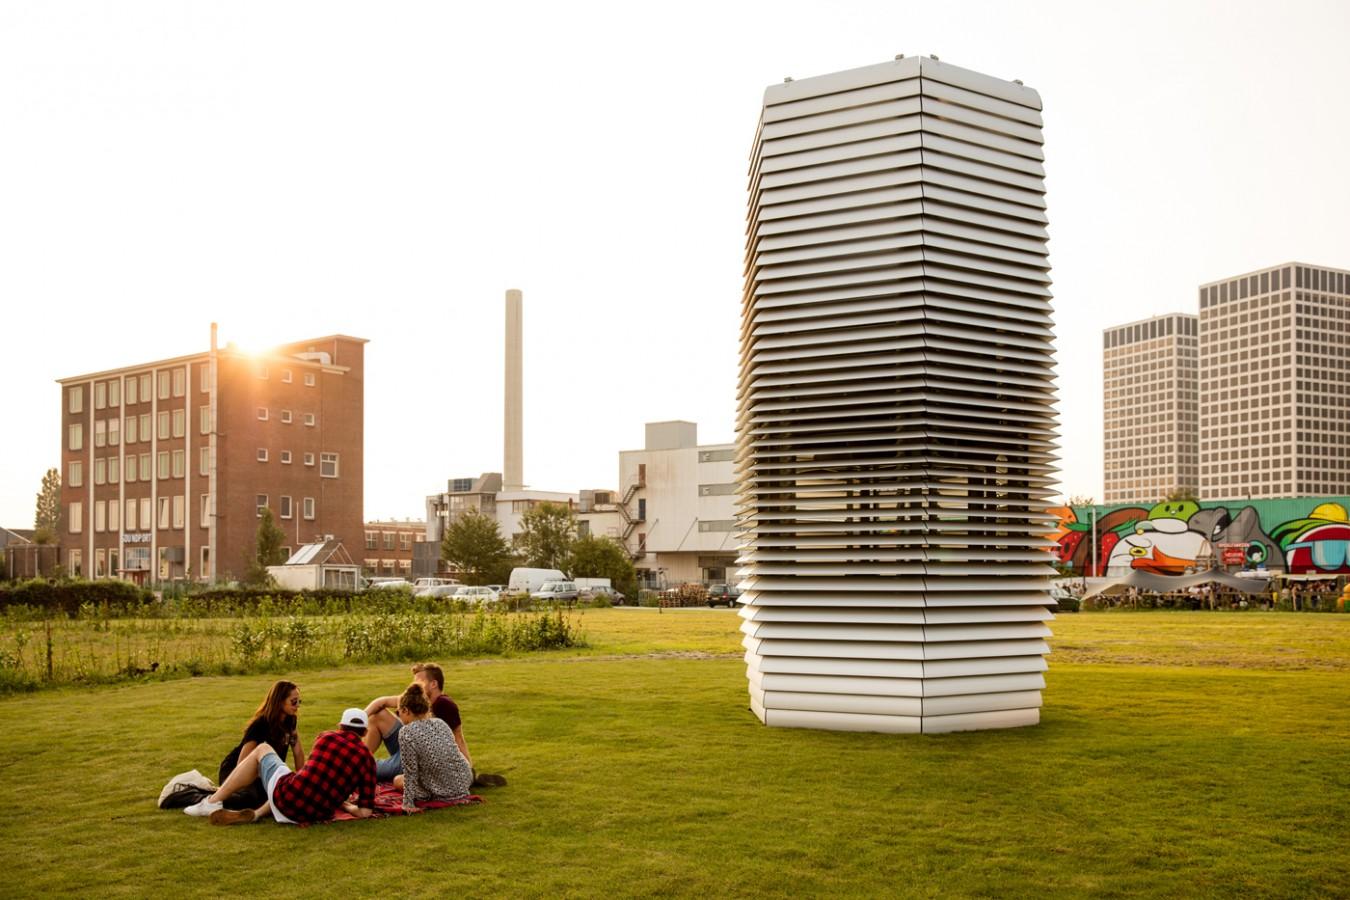 Smog Free Project Daan Roosegaarde